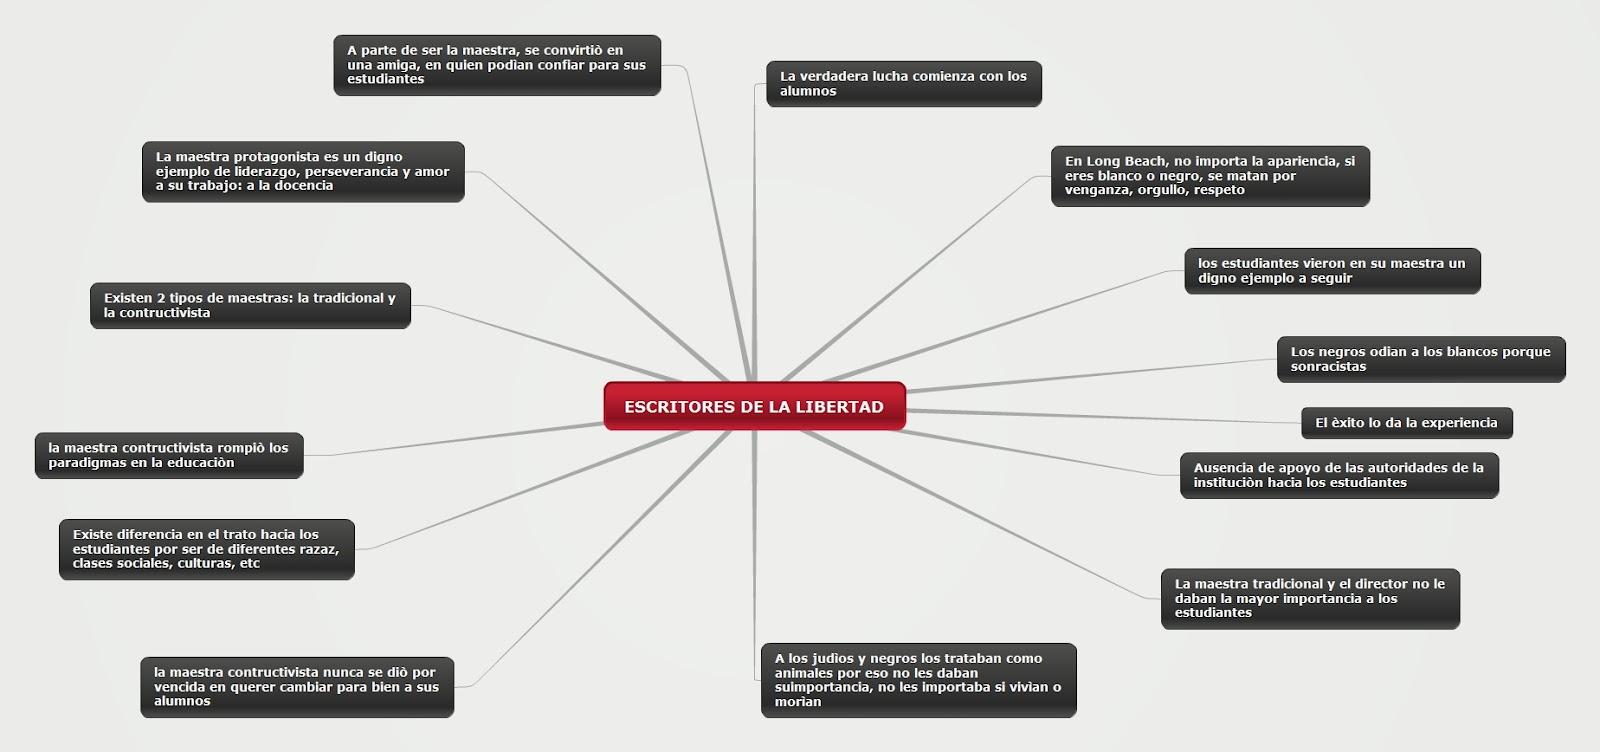 BREVE RESUMEN DE LA PELICULA: ESCRITORES DE LA LIBERTAD ...